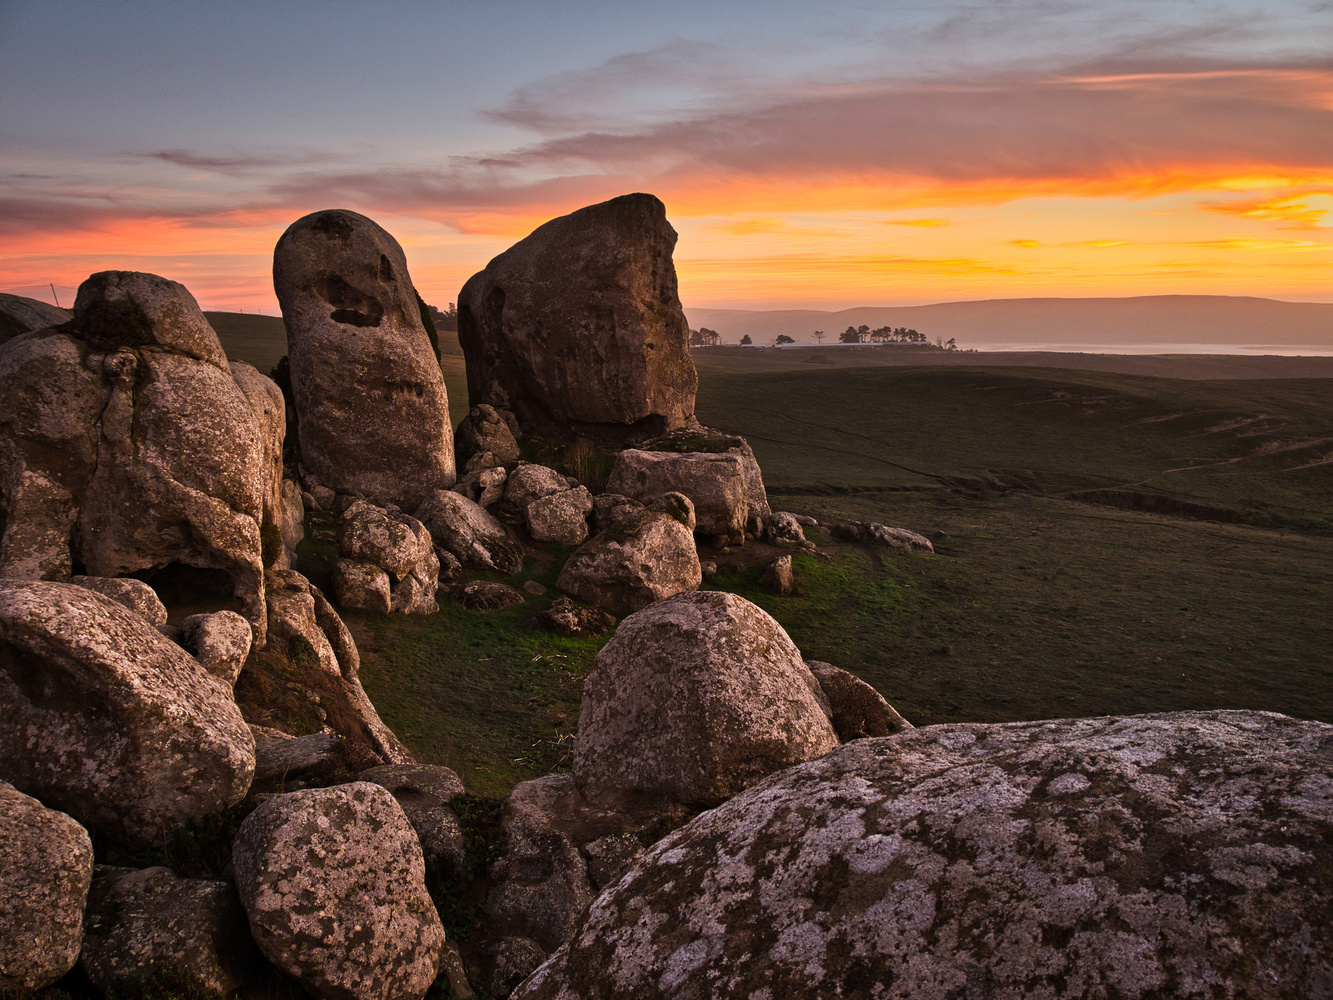 Elephant Rocks at Sunset. by David Medeiros